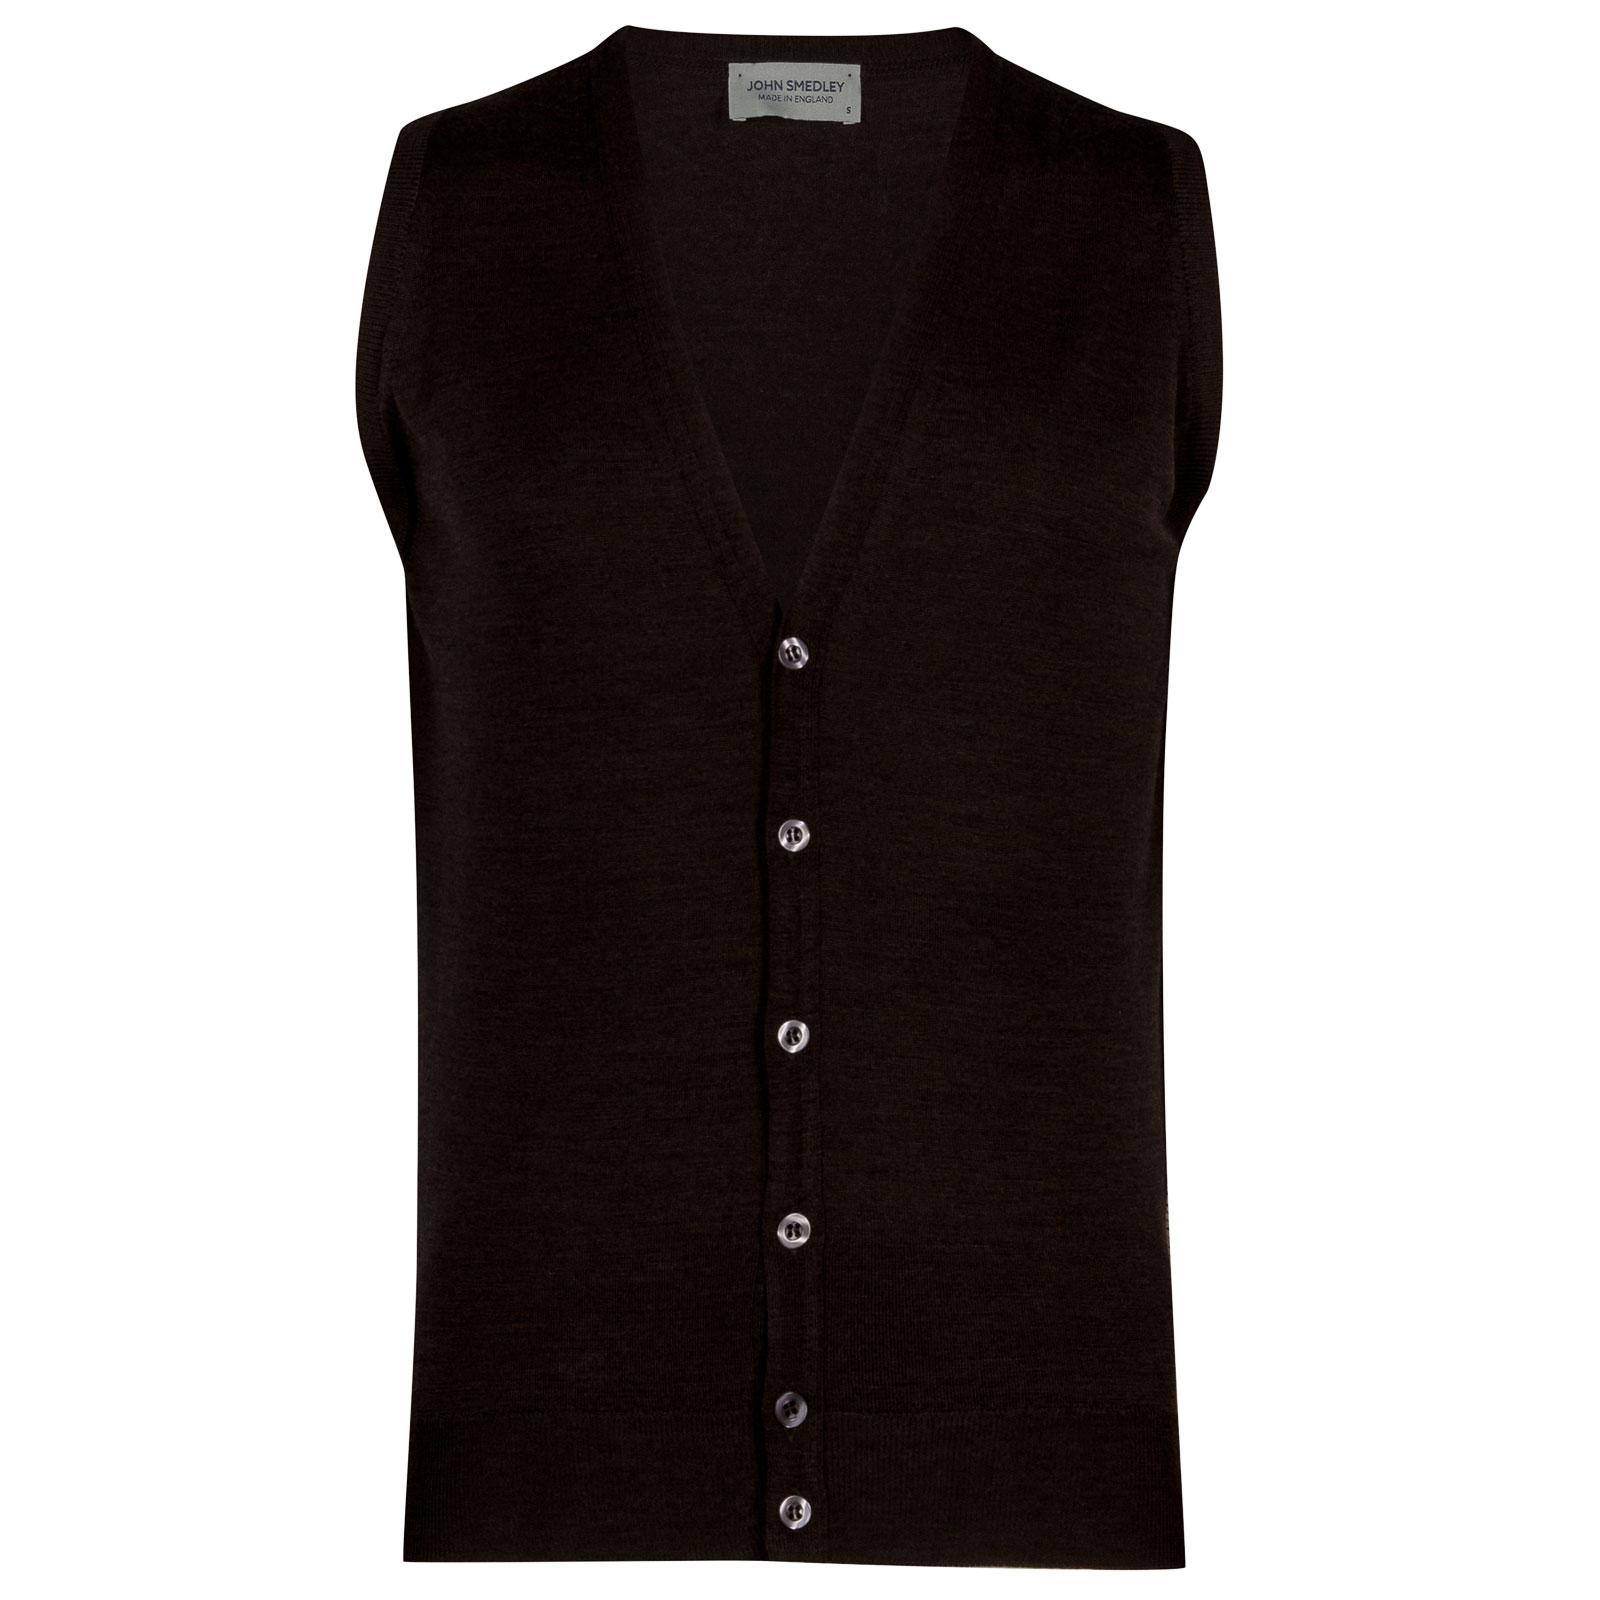 John Smedley huntswood Merino Wool Waistcoat in Chestnut-S